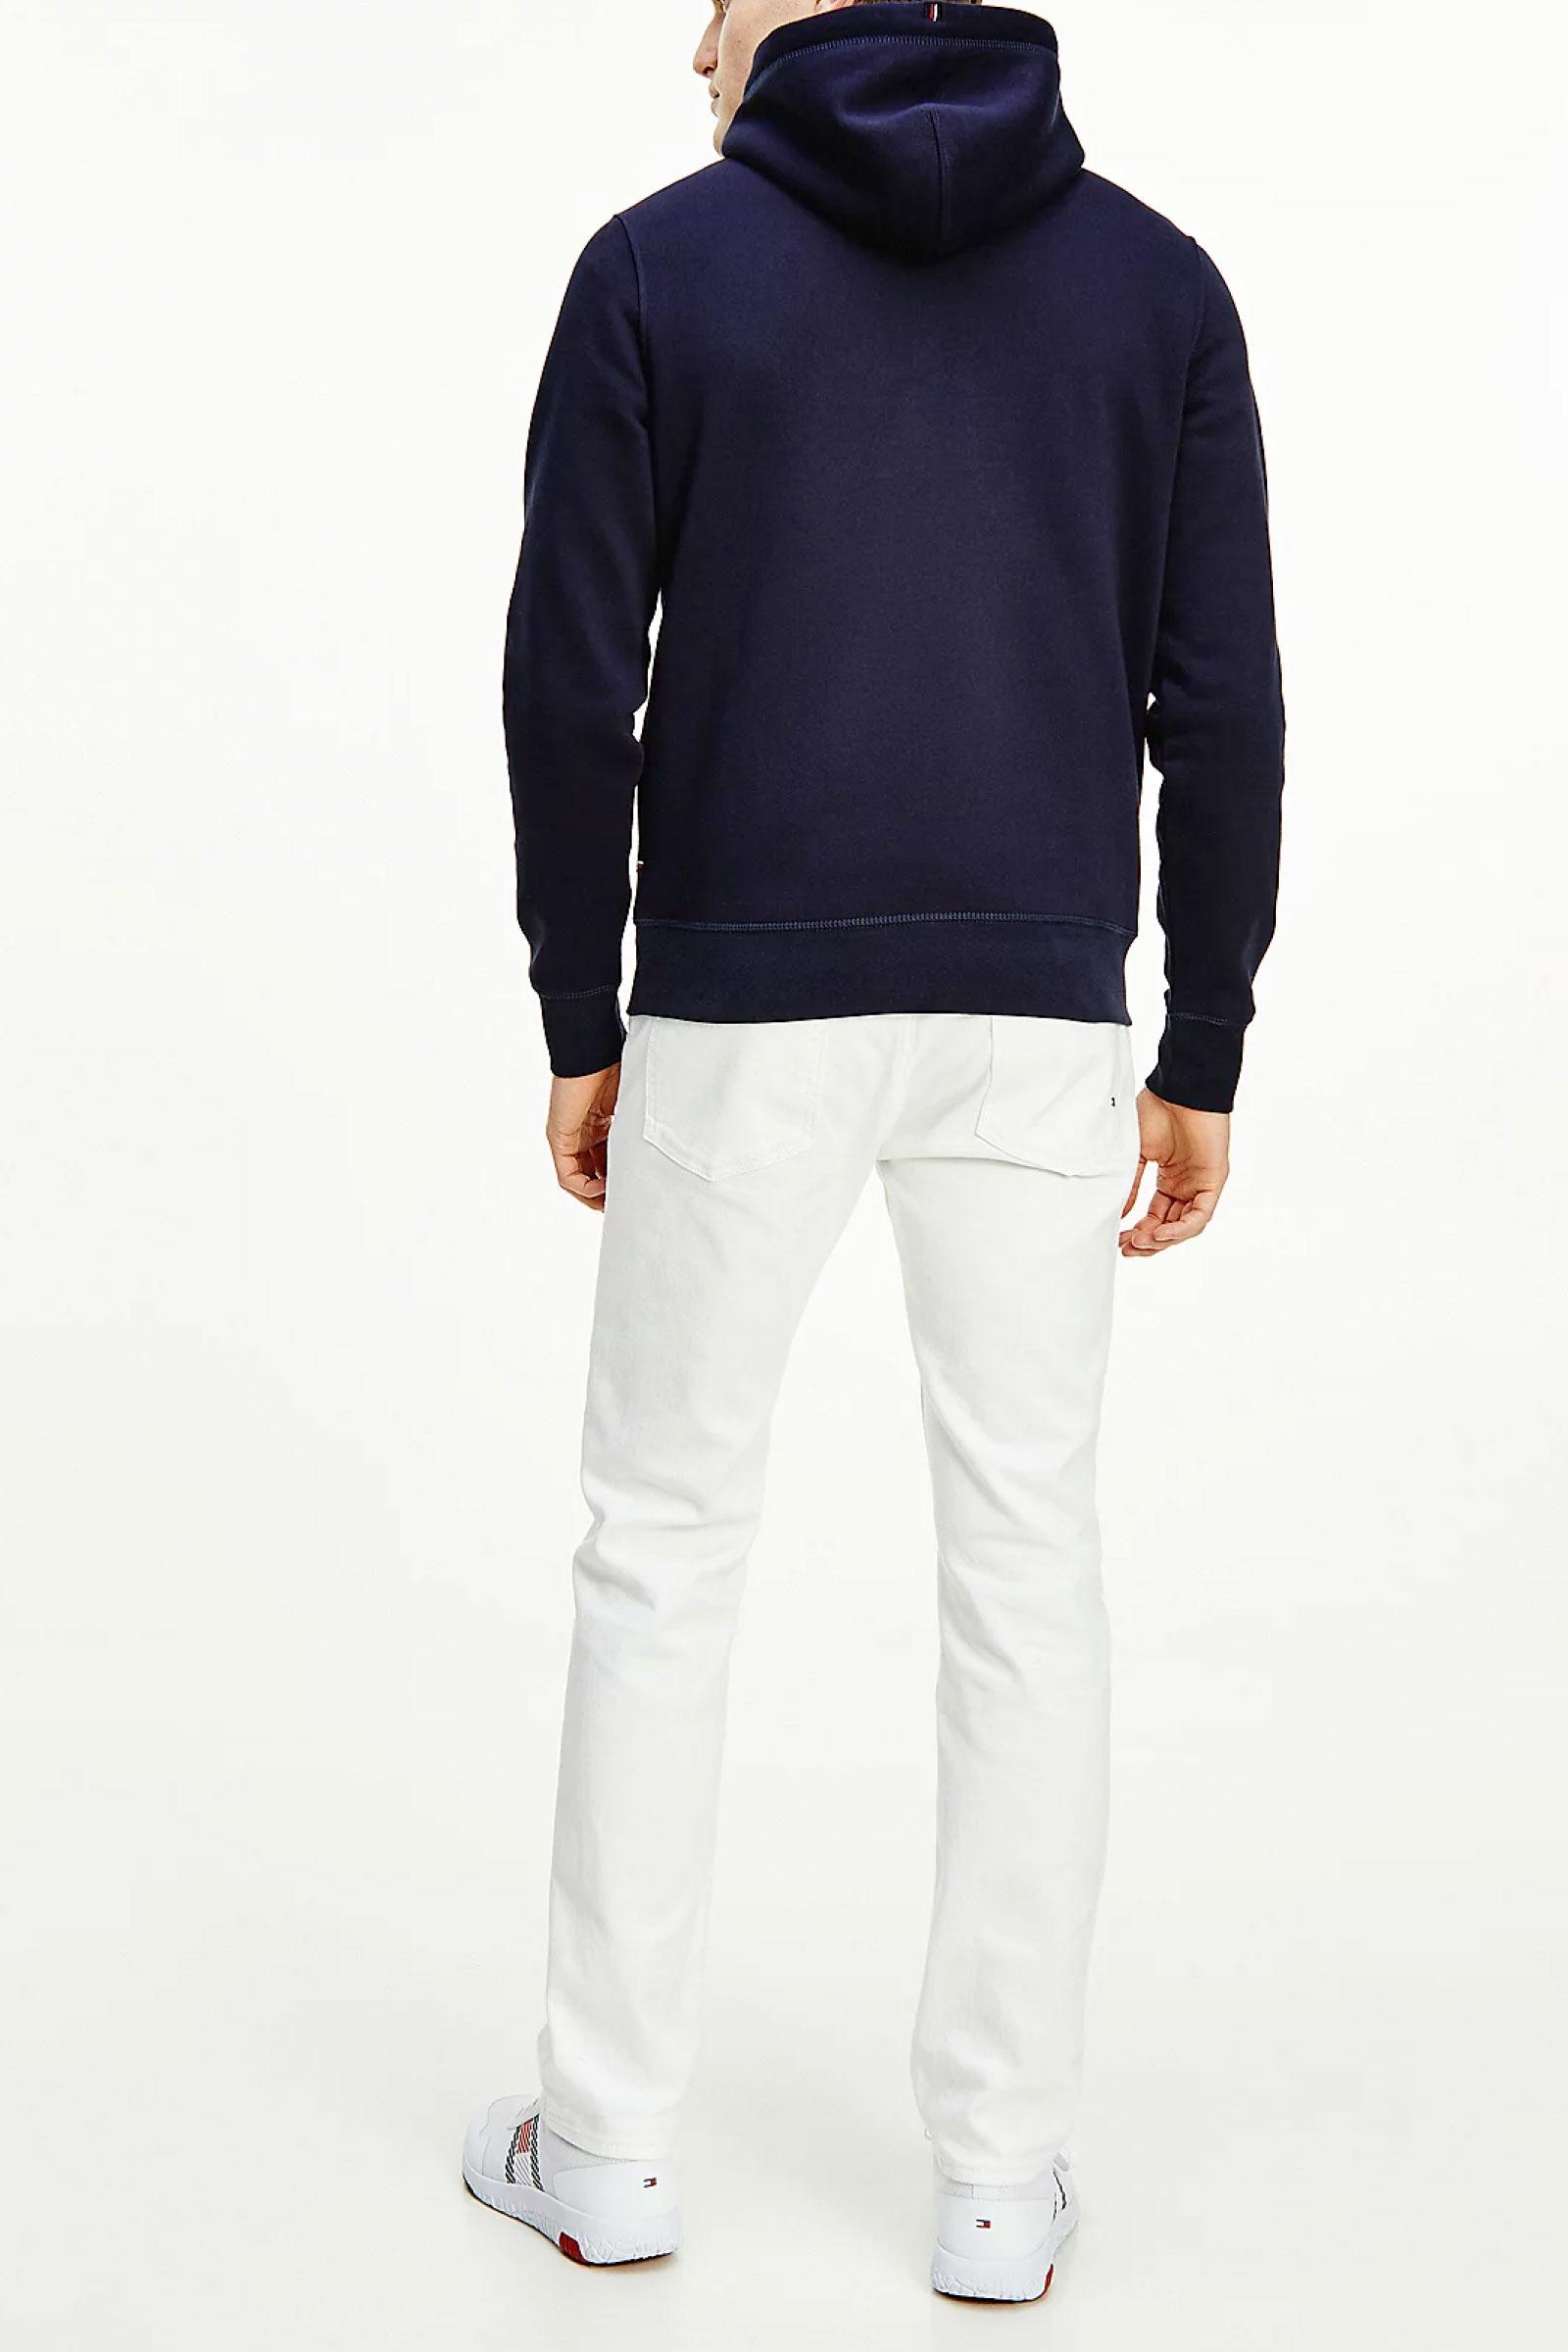 TOMMY HILFIGER   Sweatshirt   MW0MW17397DW5